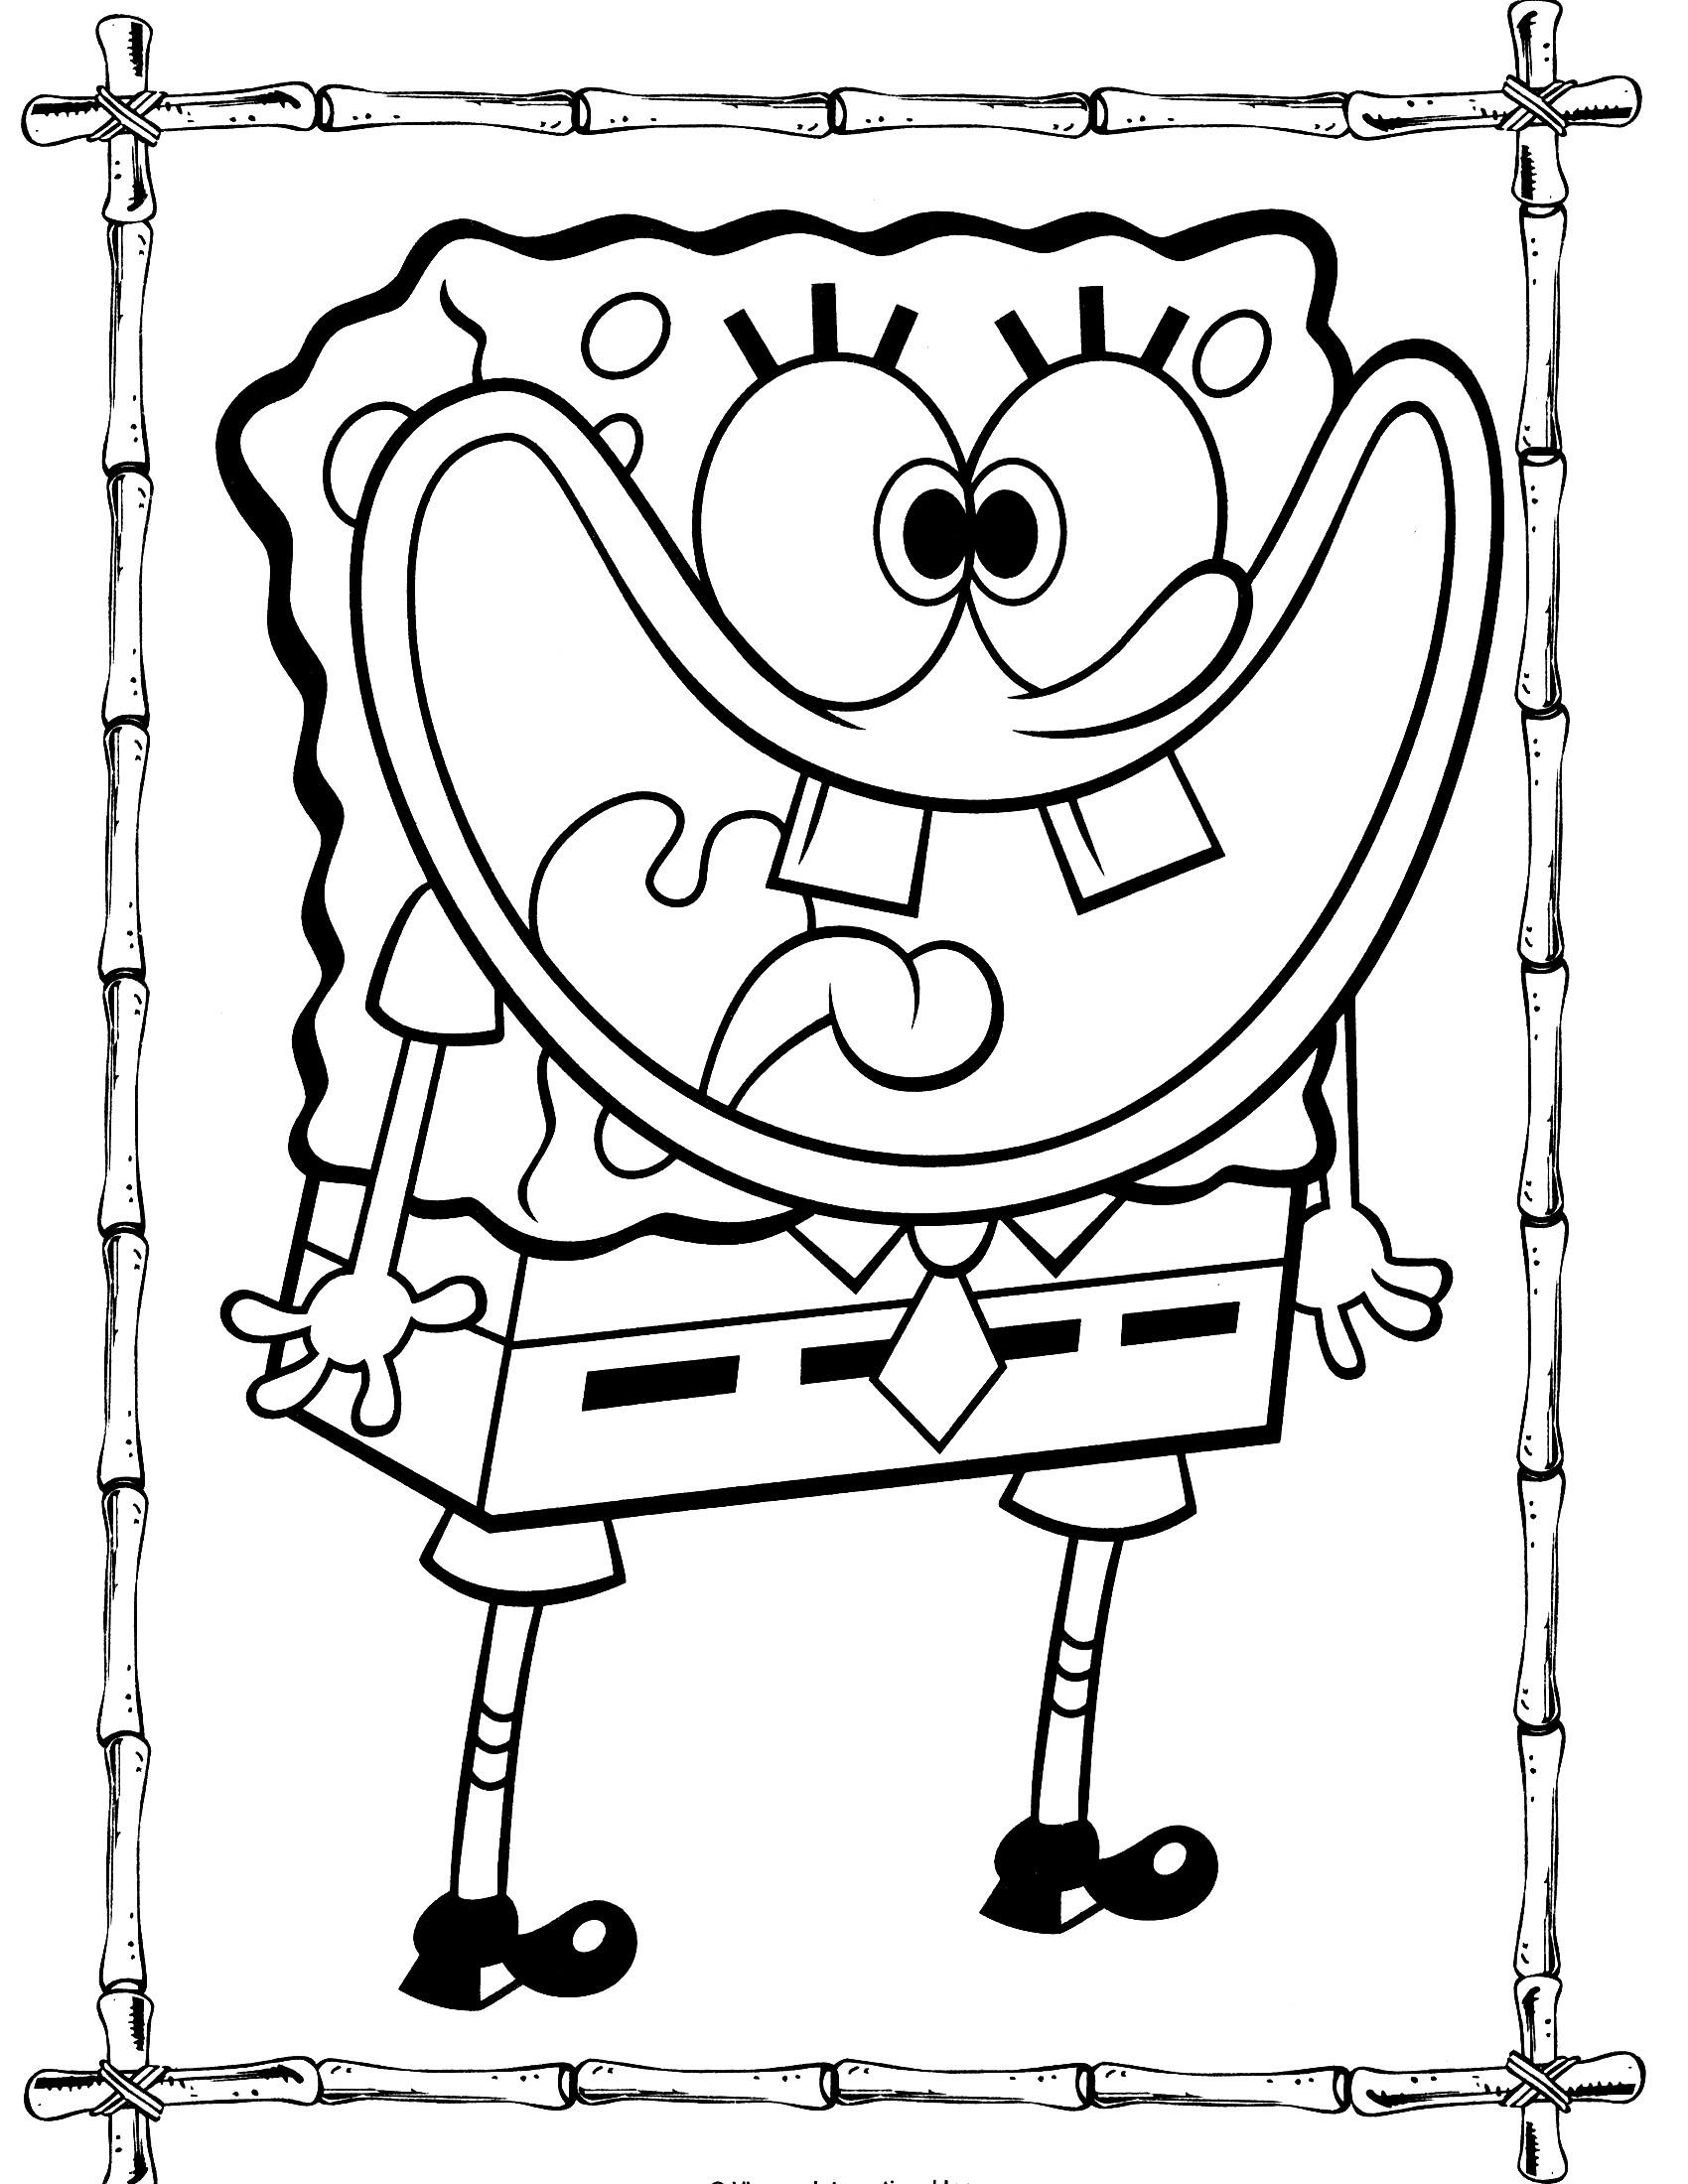 1700x2200 Spongebob Squarepants Coloring Pages Luxury Funny Spongebob